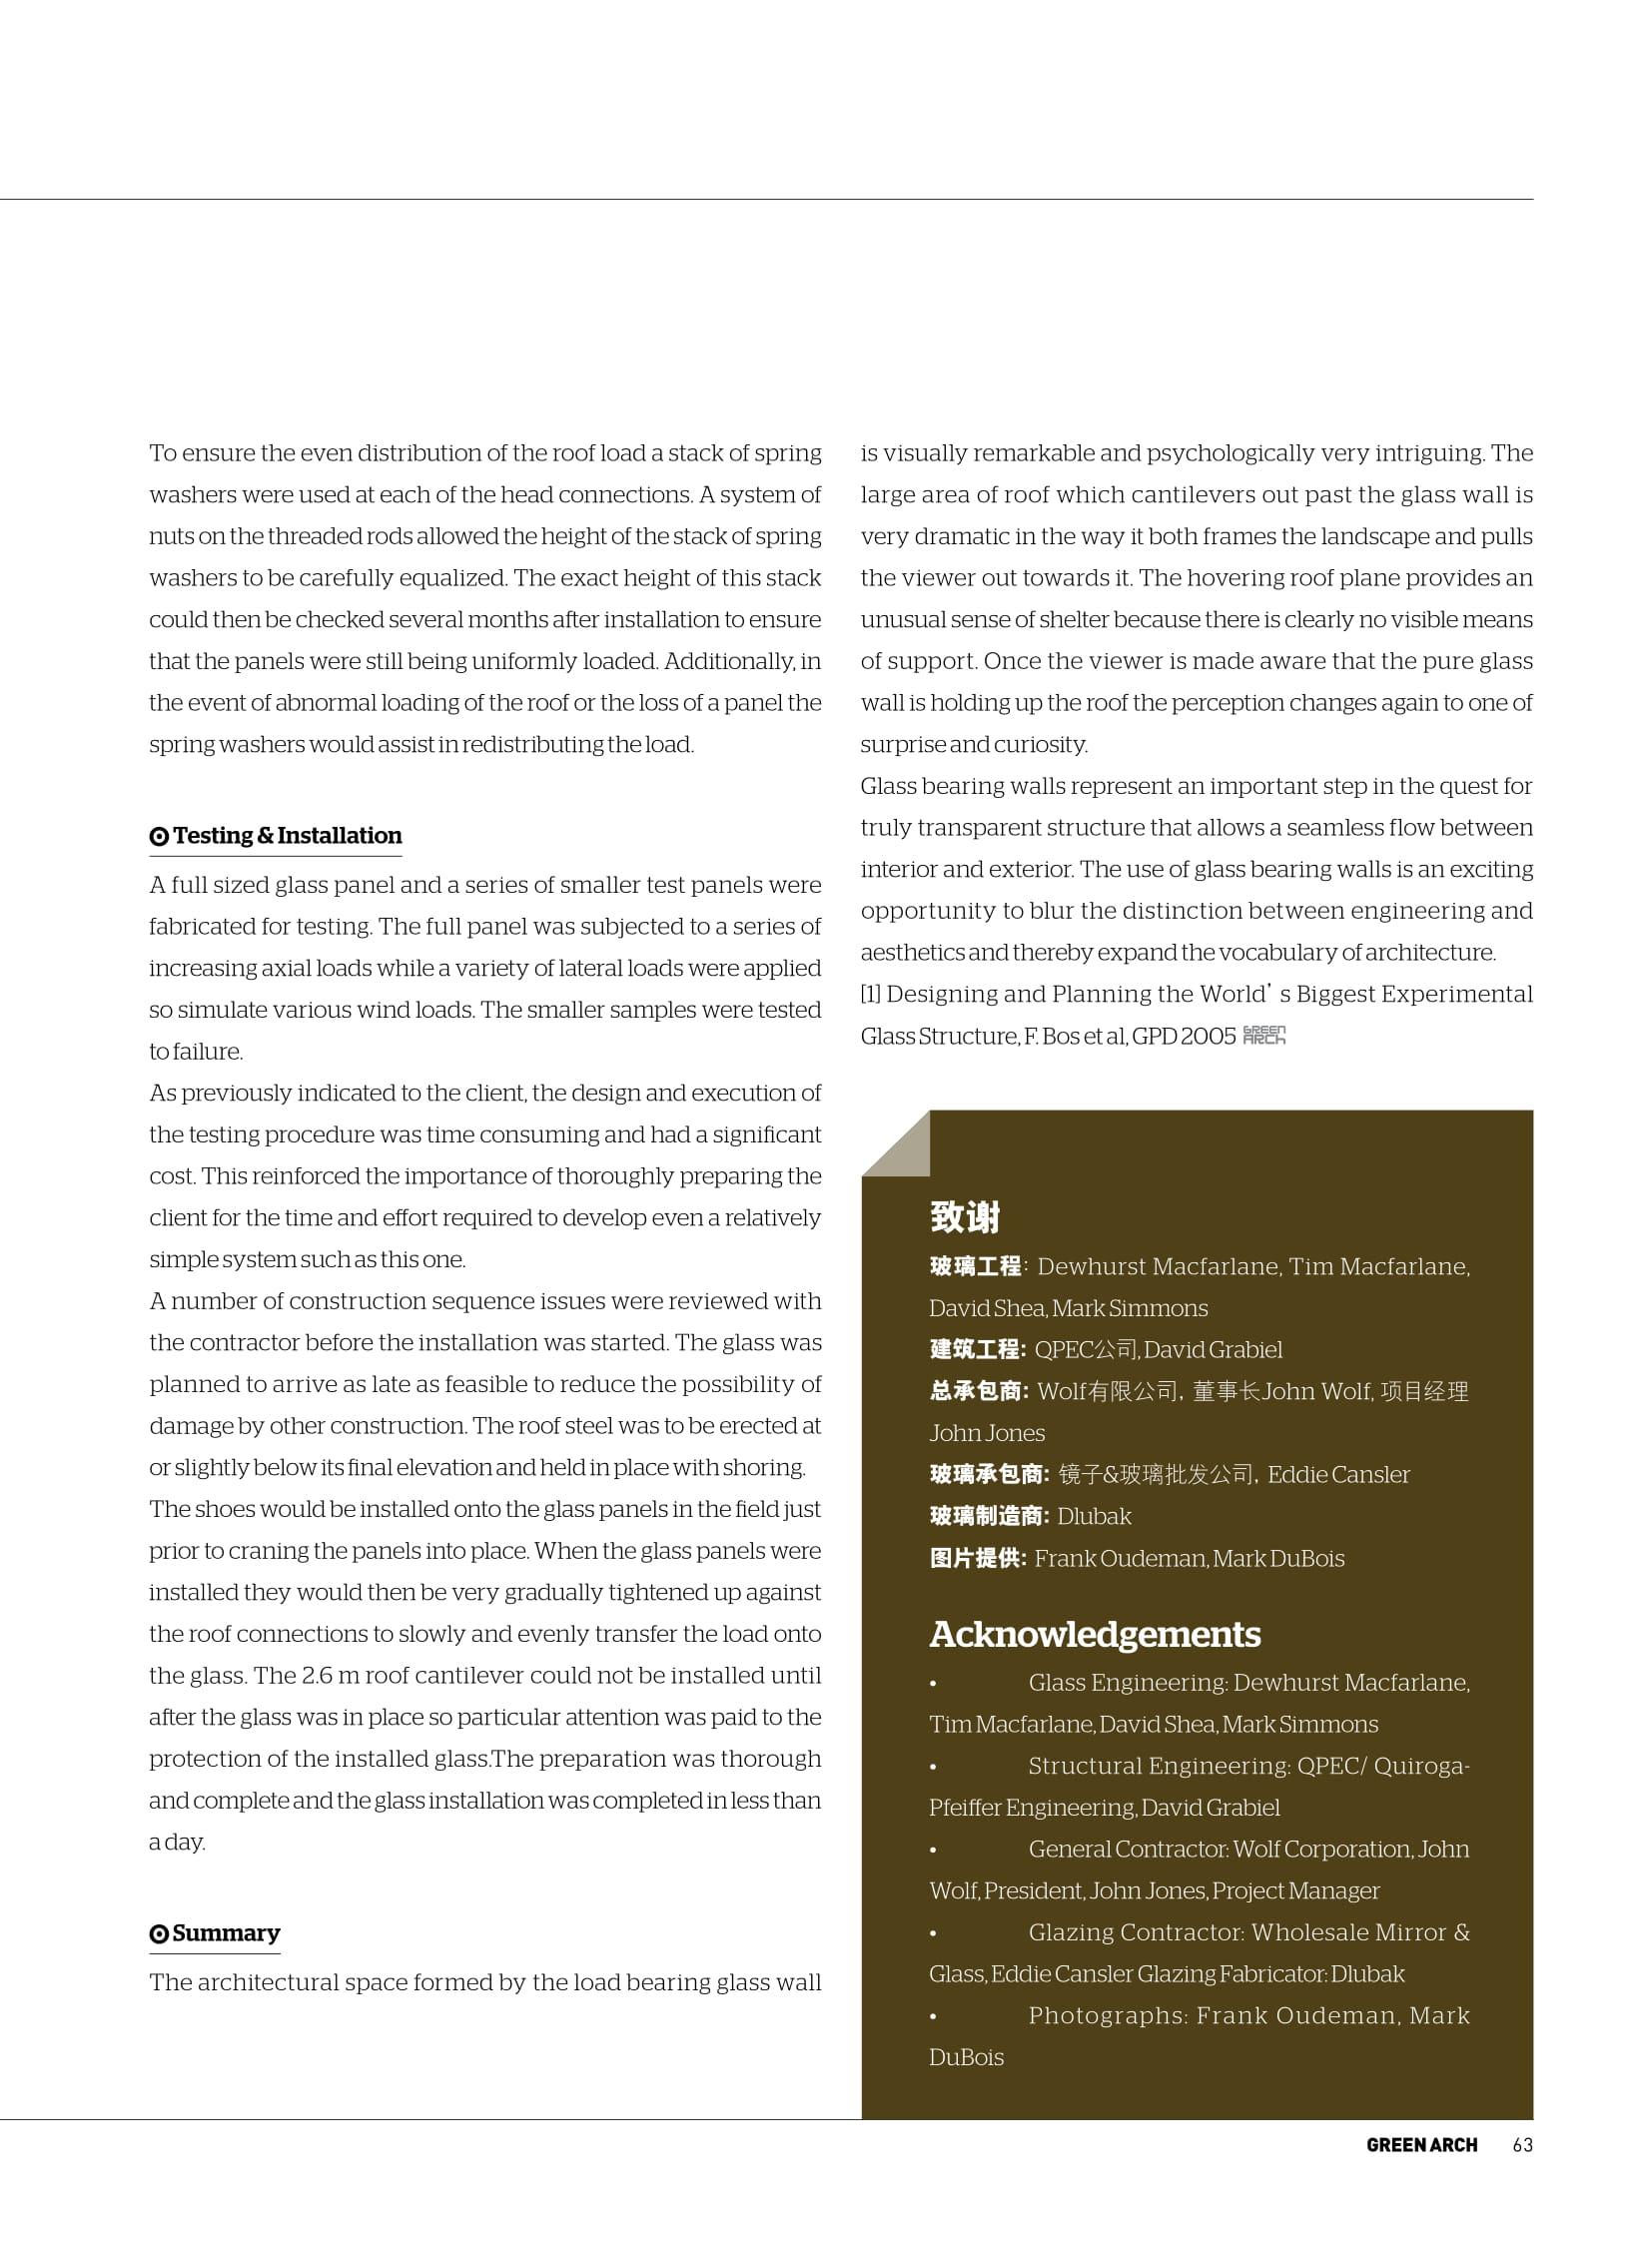 DuBois+Santa+Fe+IGA+Glass+Bearing+Wall-12.jpg